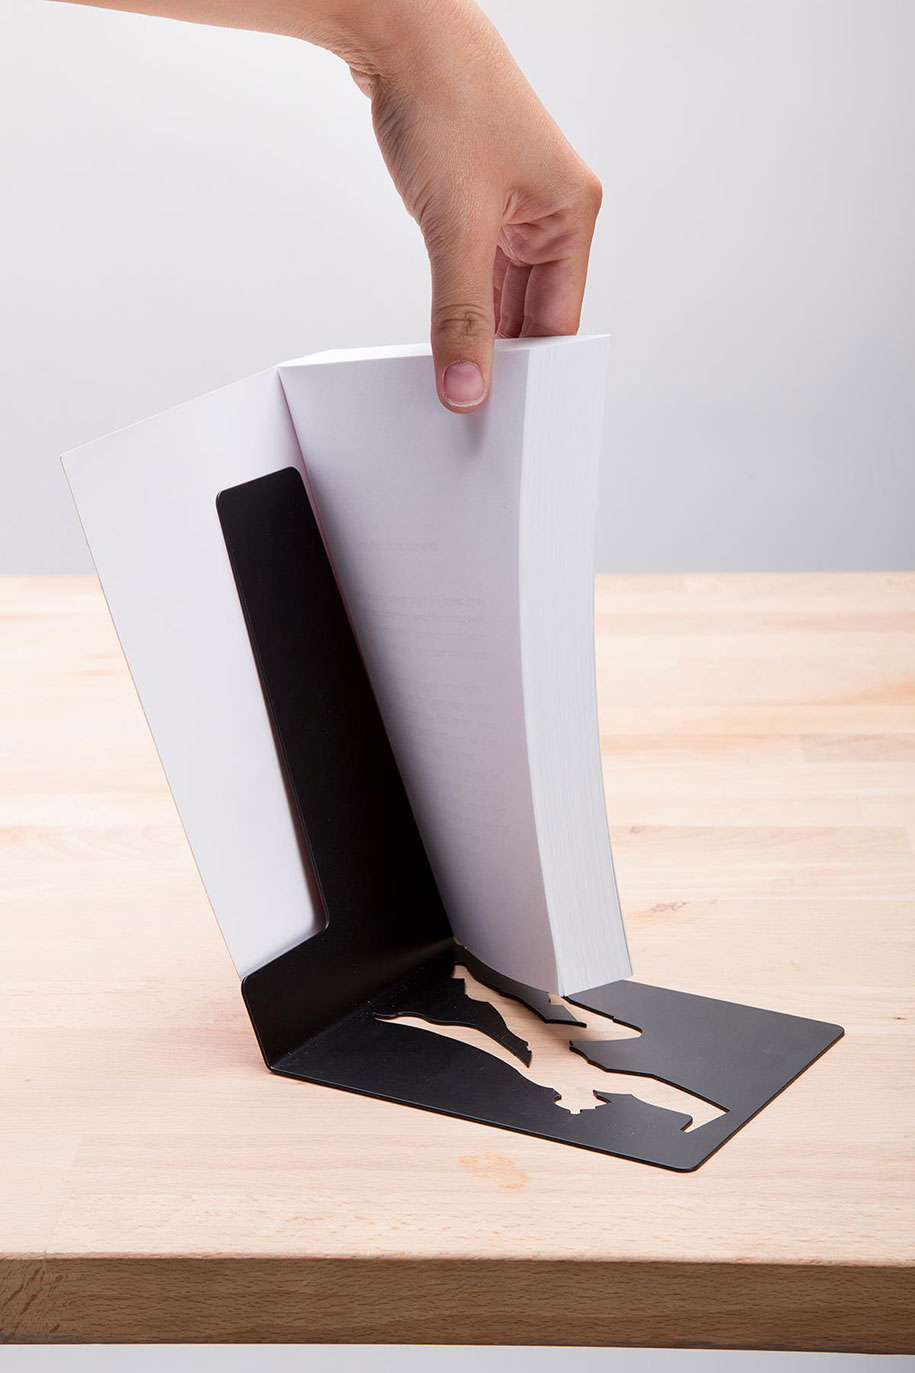 superhero-bookend-book-hero-supershelf-artori-design-2